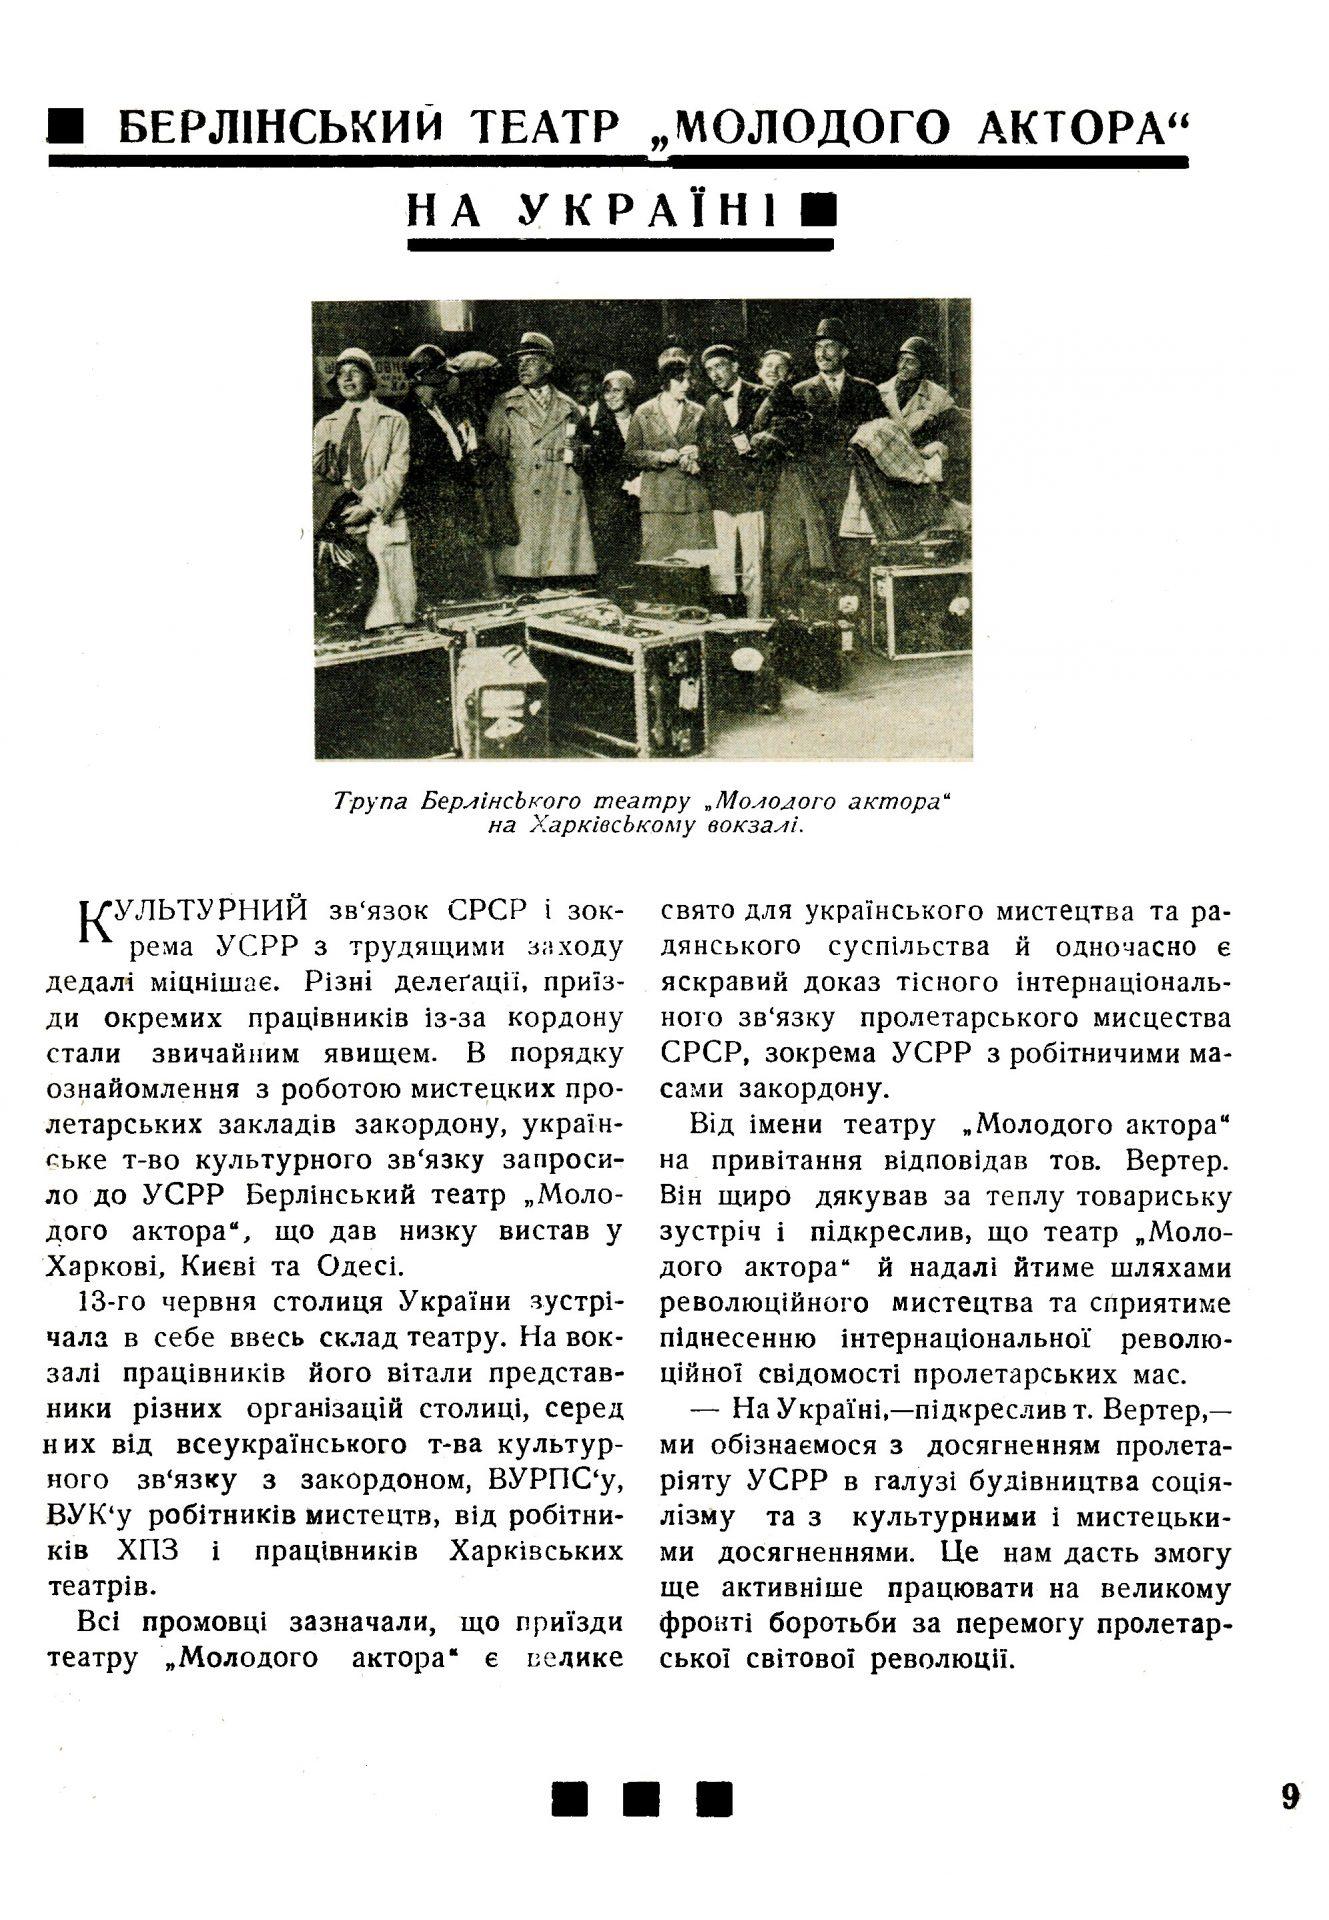 Мистецька трибуна_1930_№ 8-9